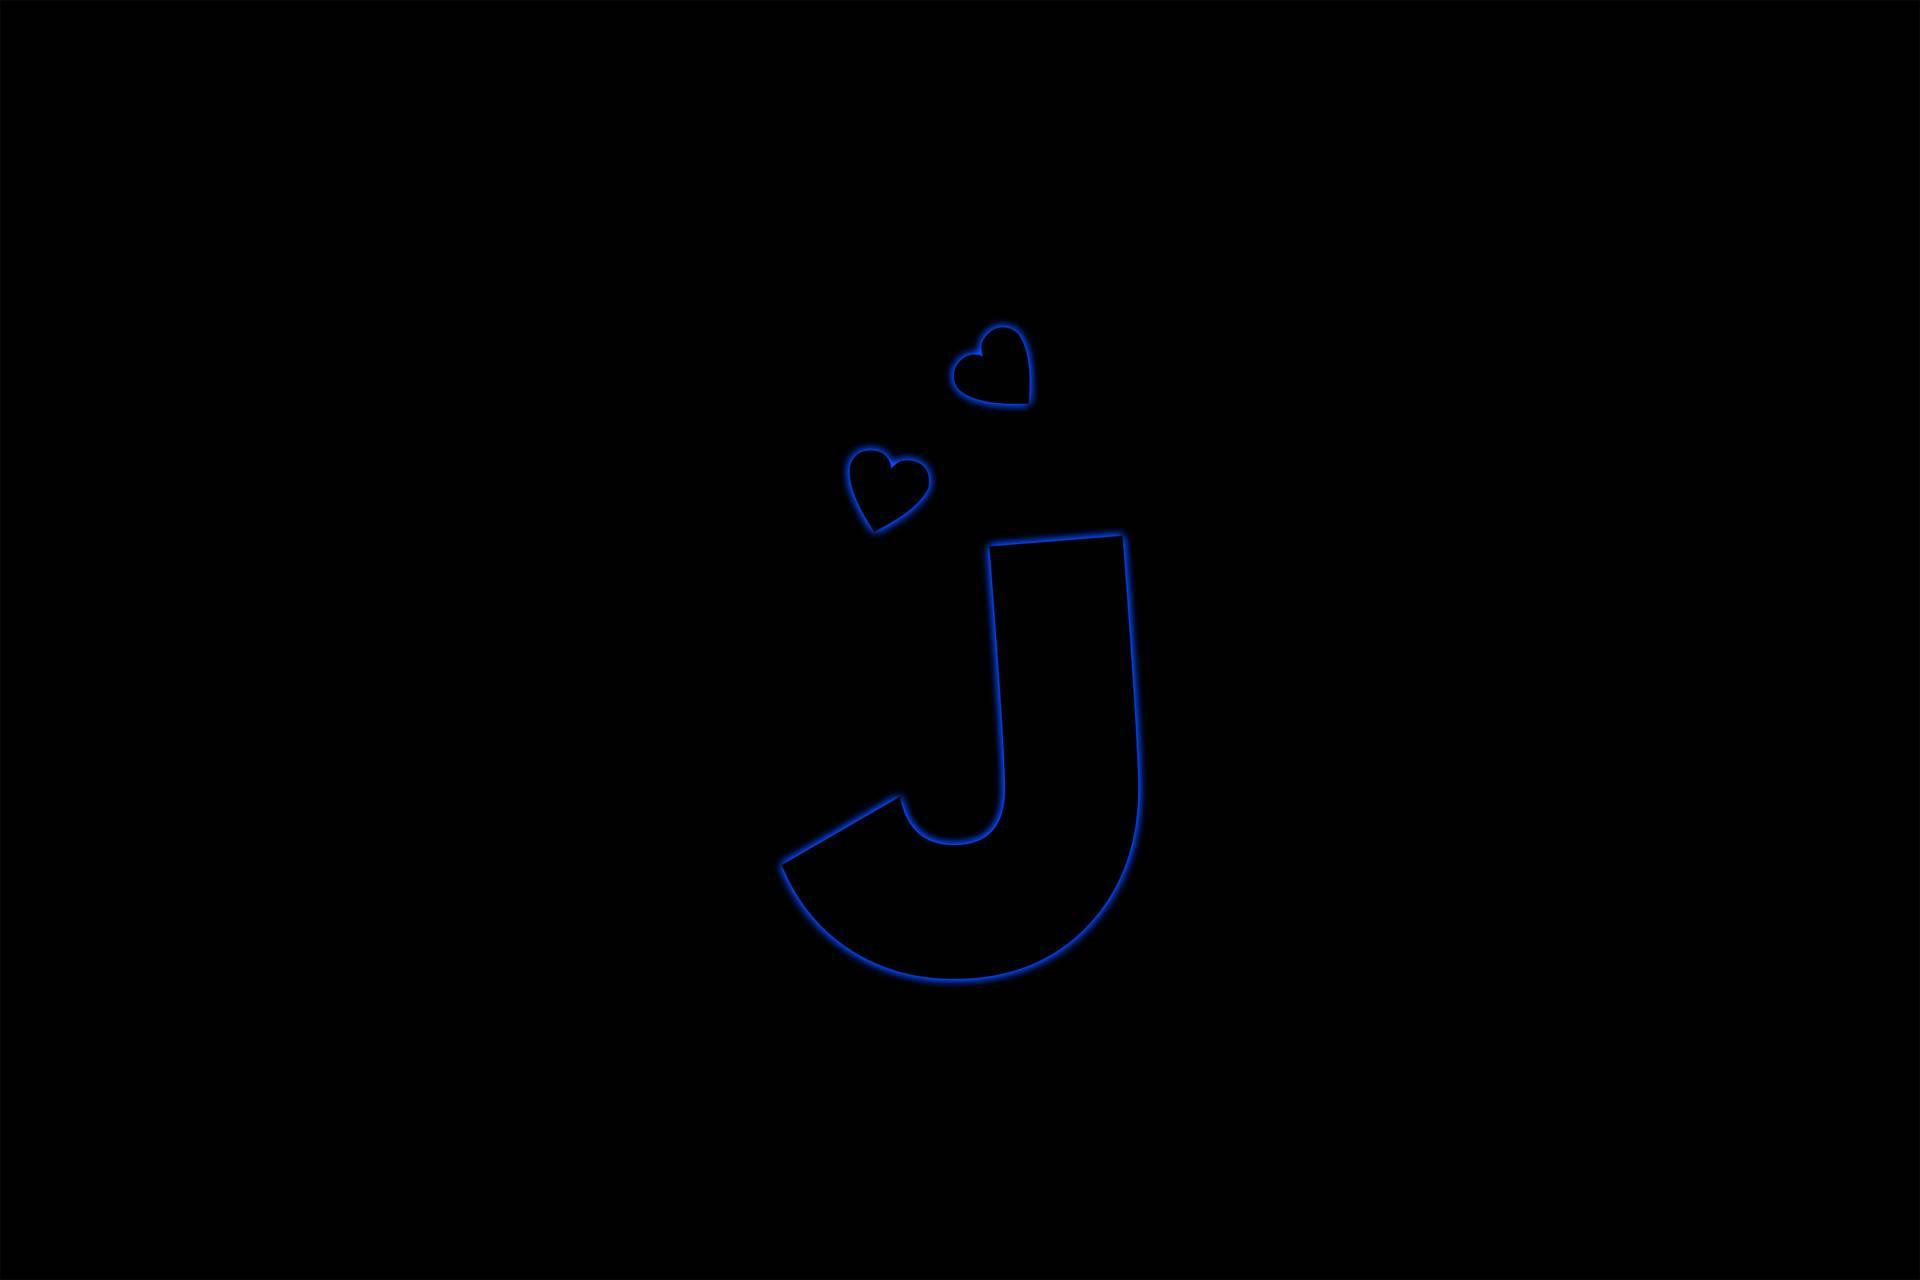 My Name J